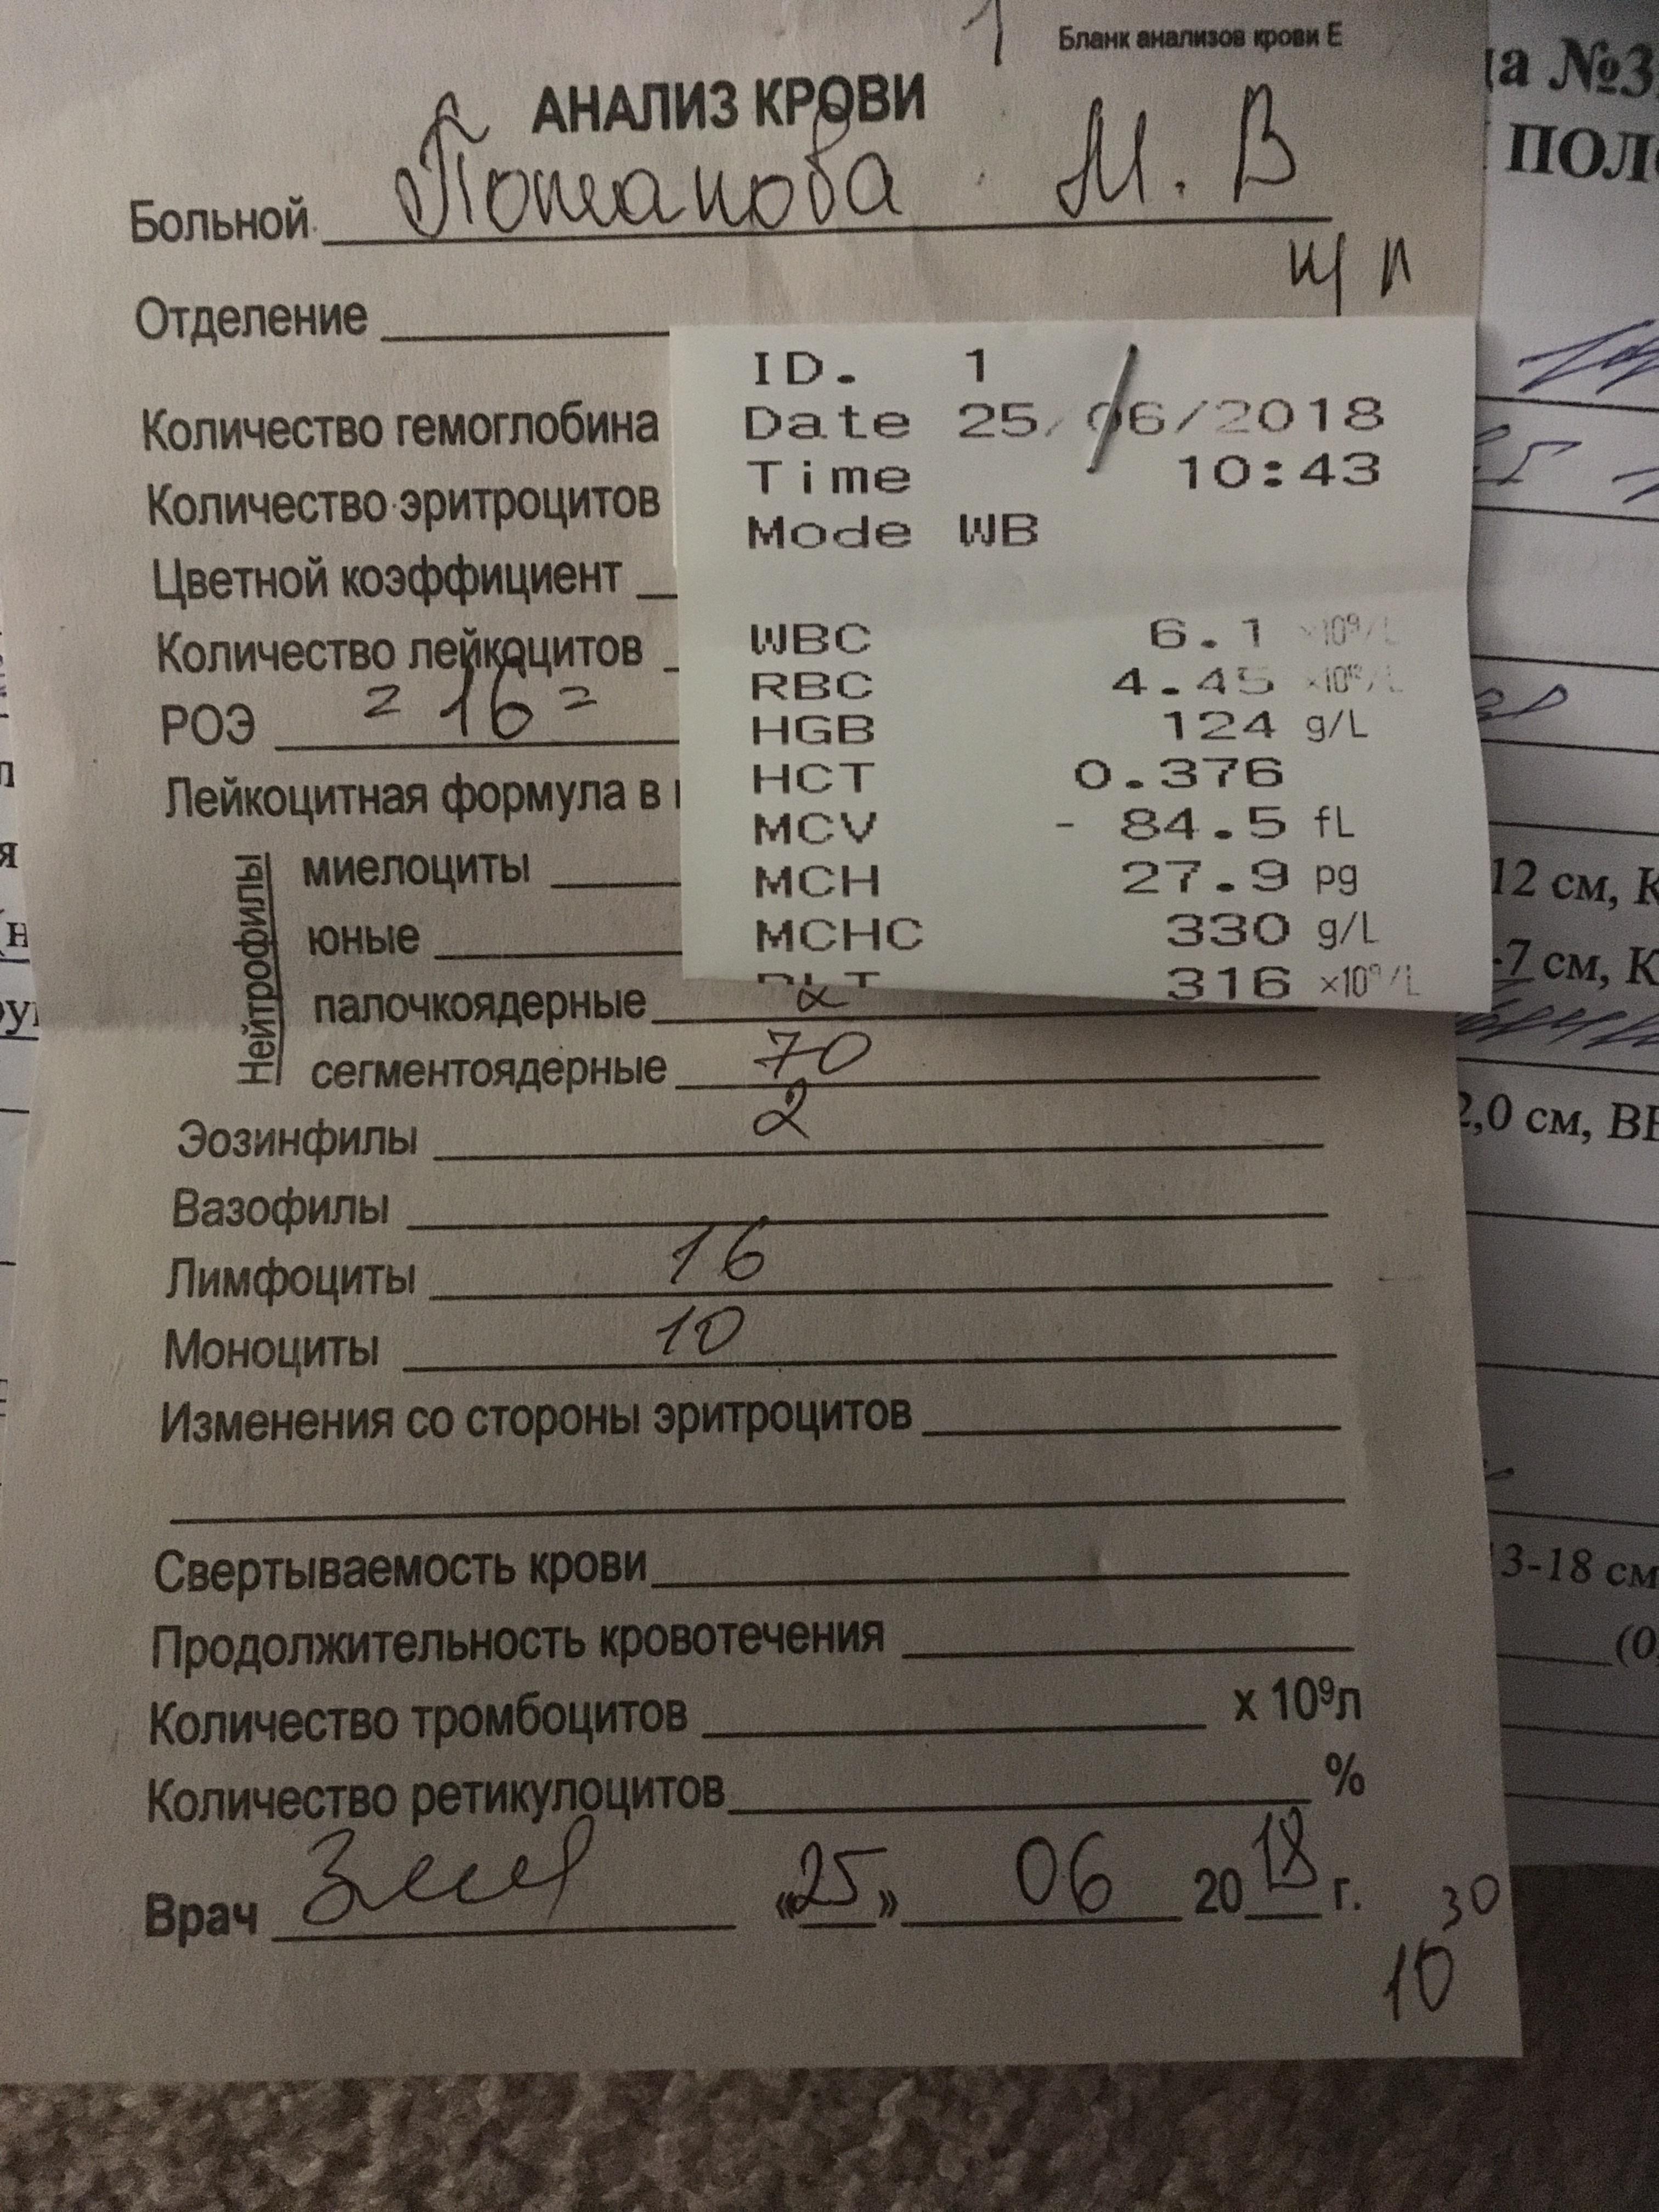 Для крови бланки сдачи анализа тг анализ к на крови антитела